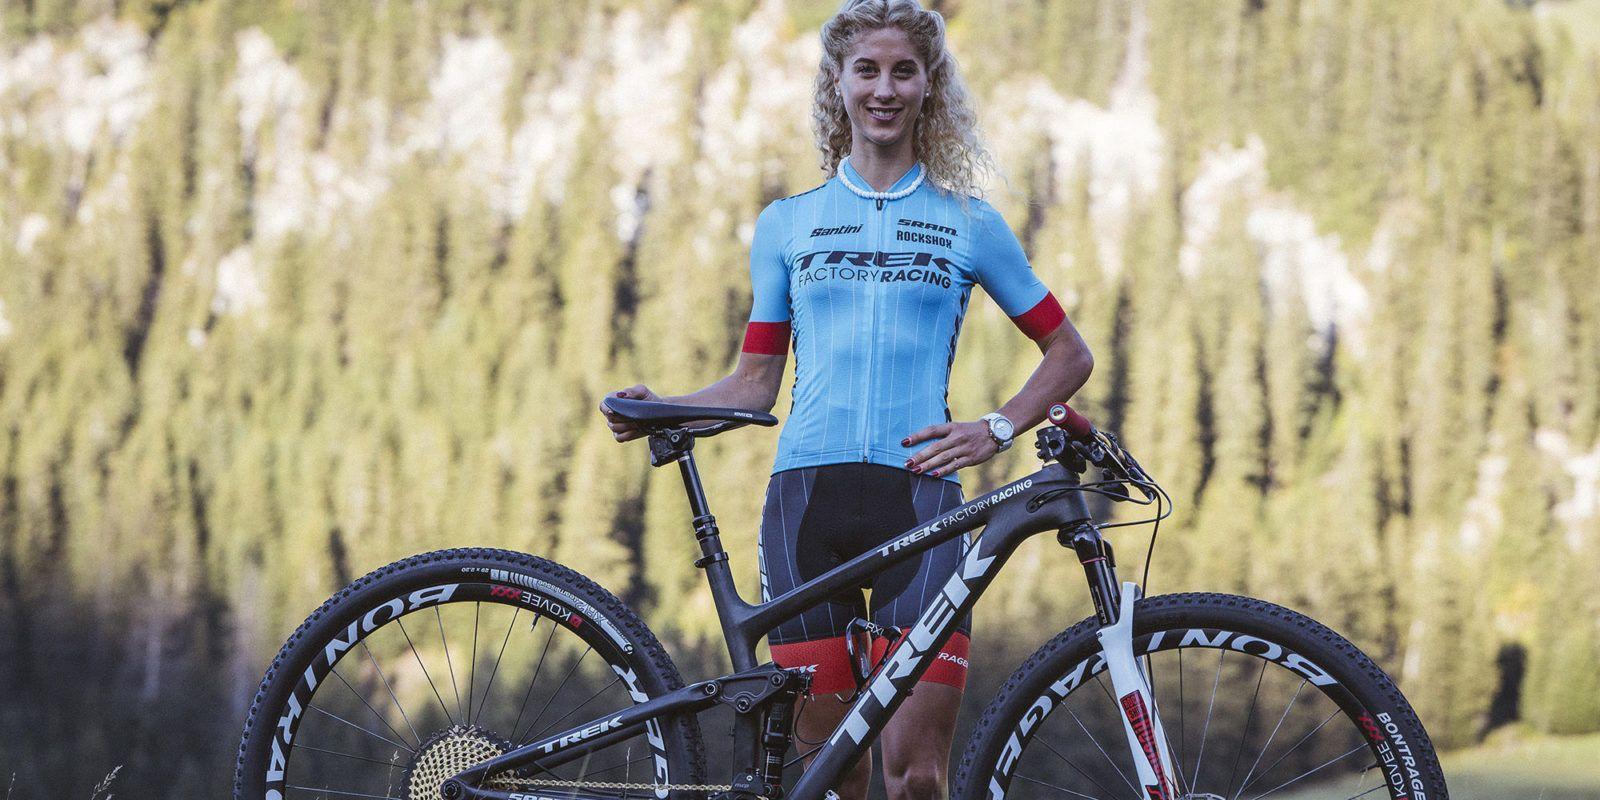 World Cup Champion Jolanda Neff Joins Trek Factory Racing Xc